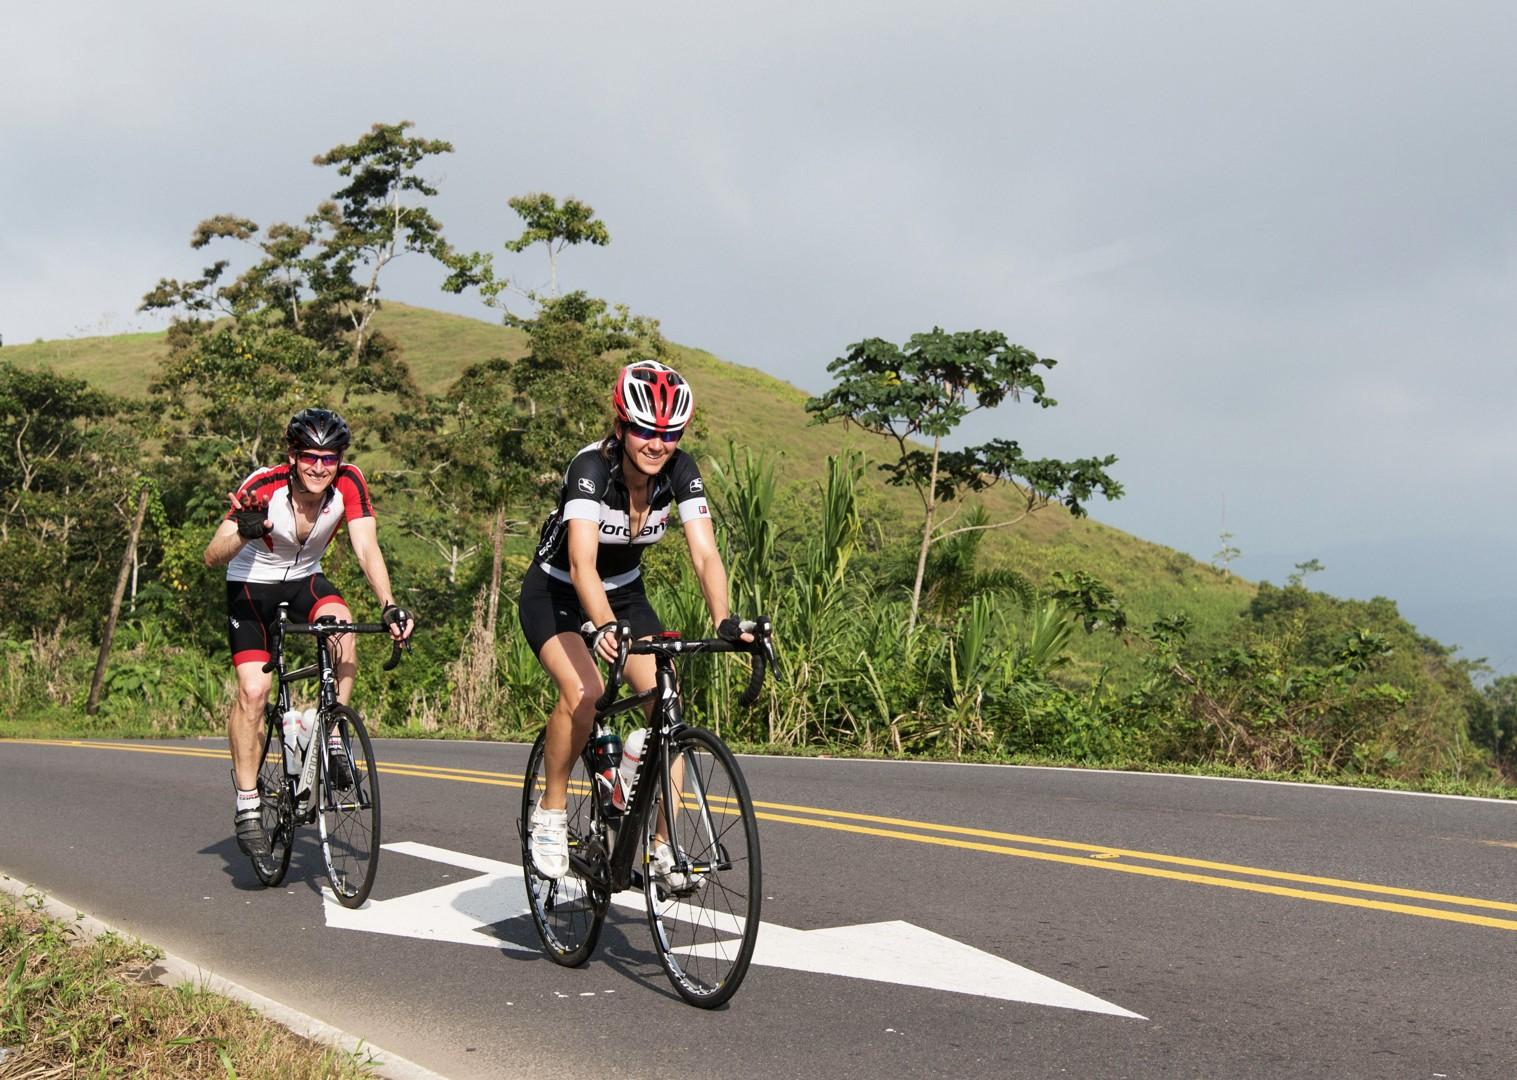 costa-rica-guided-road-cycling-holiday-ruta-de-los-volcanes.jpg - Costa Rica - Ruta de los Volcanes - Road Cycling